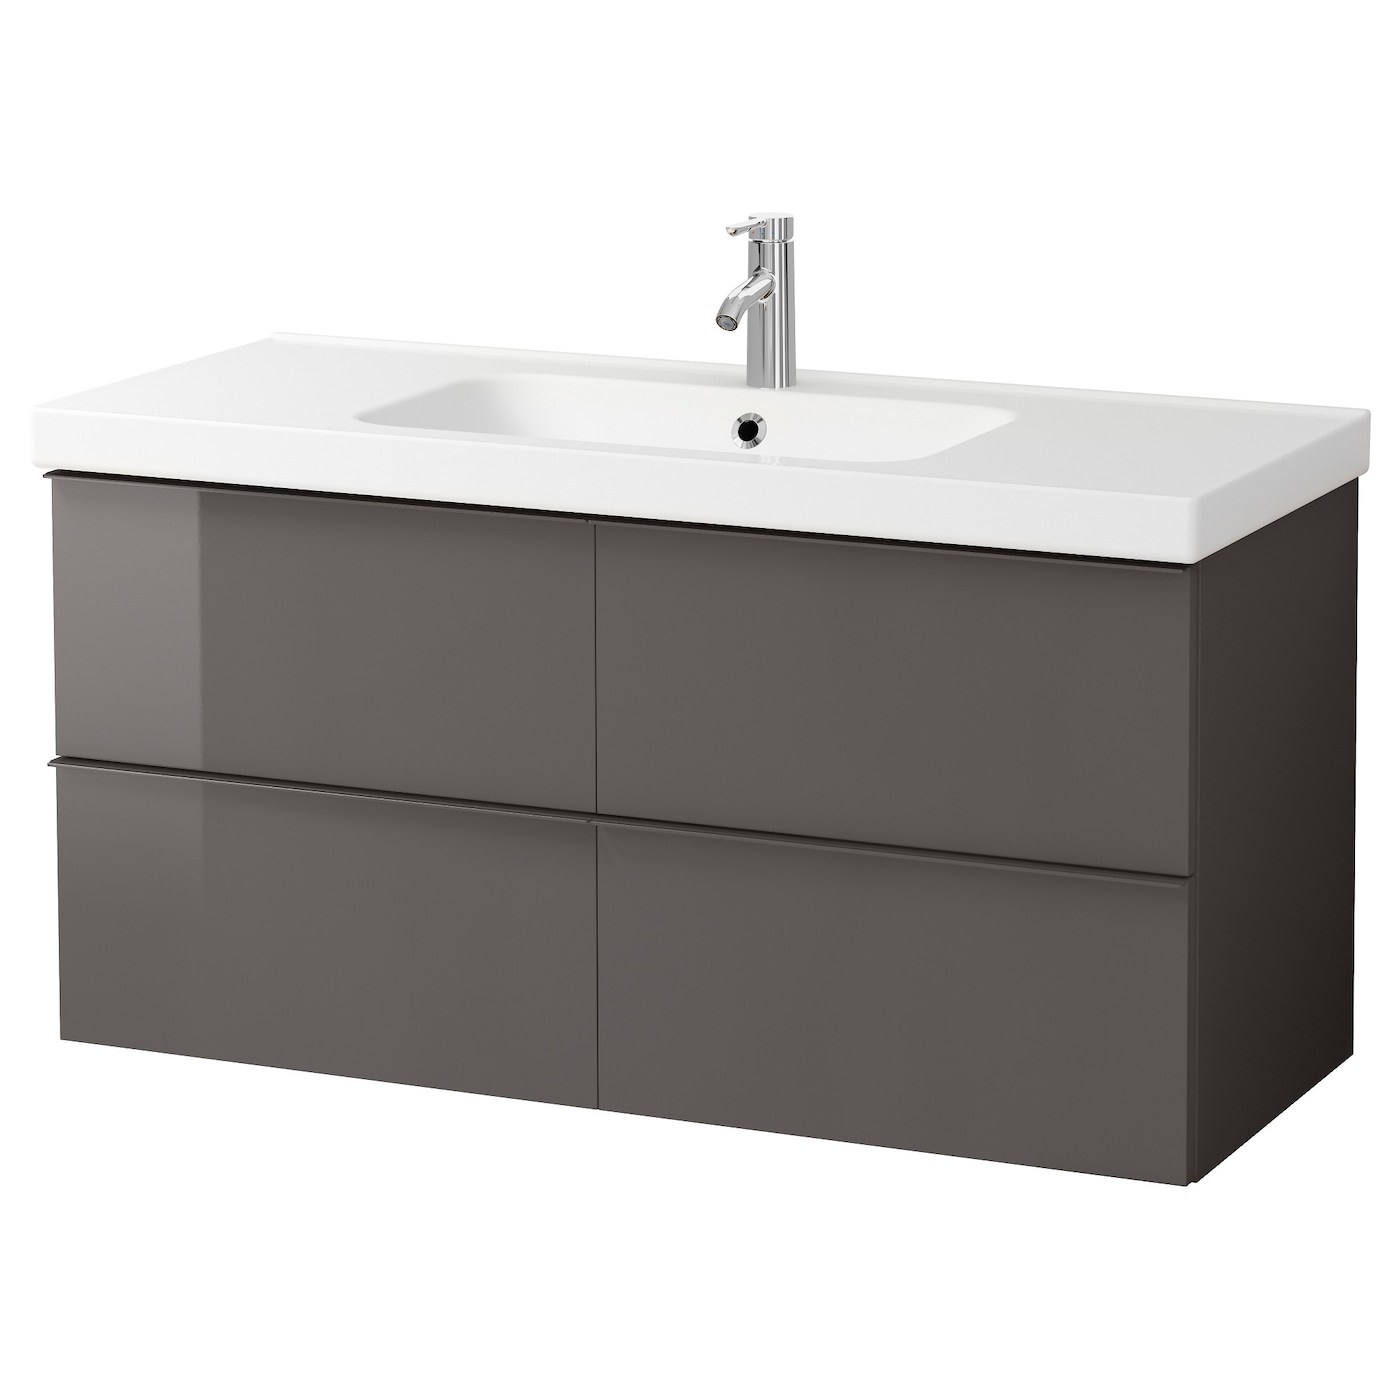 Odensvik godmorgon meuble lavabo 4tir brillant gris for Meubles lavabo ikea